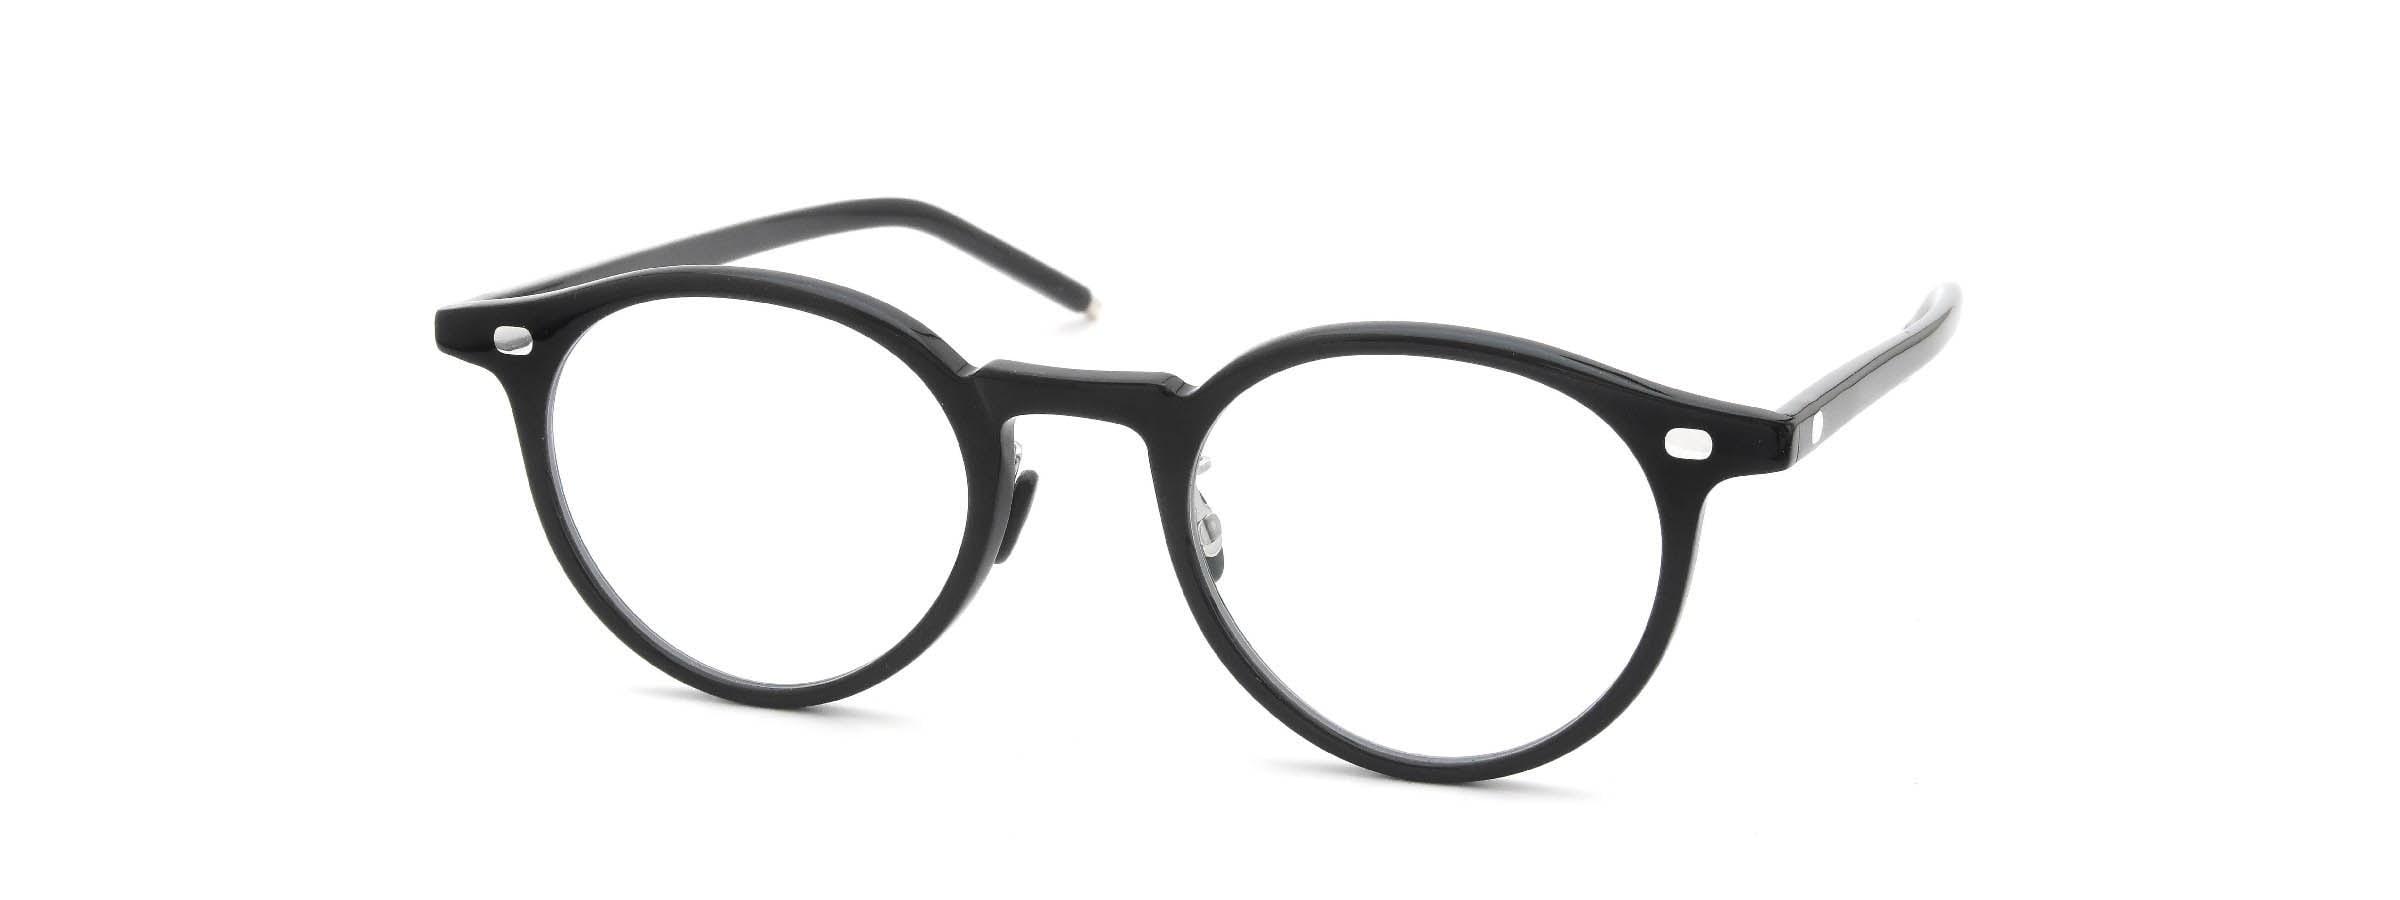 10 eyevan NO.3 Ⅲ 47size